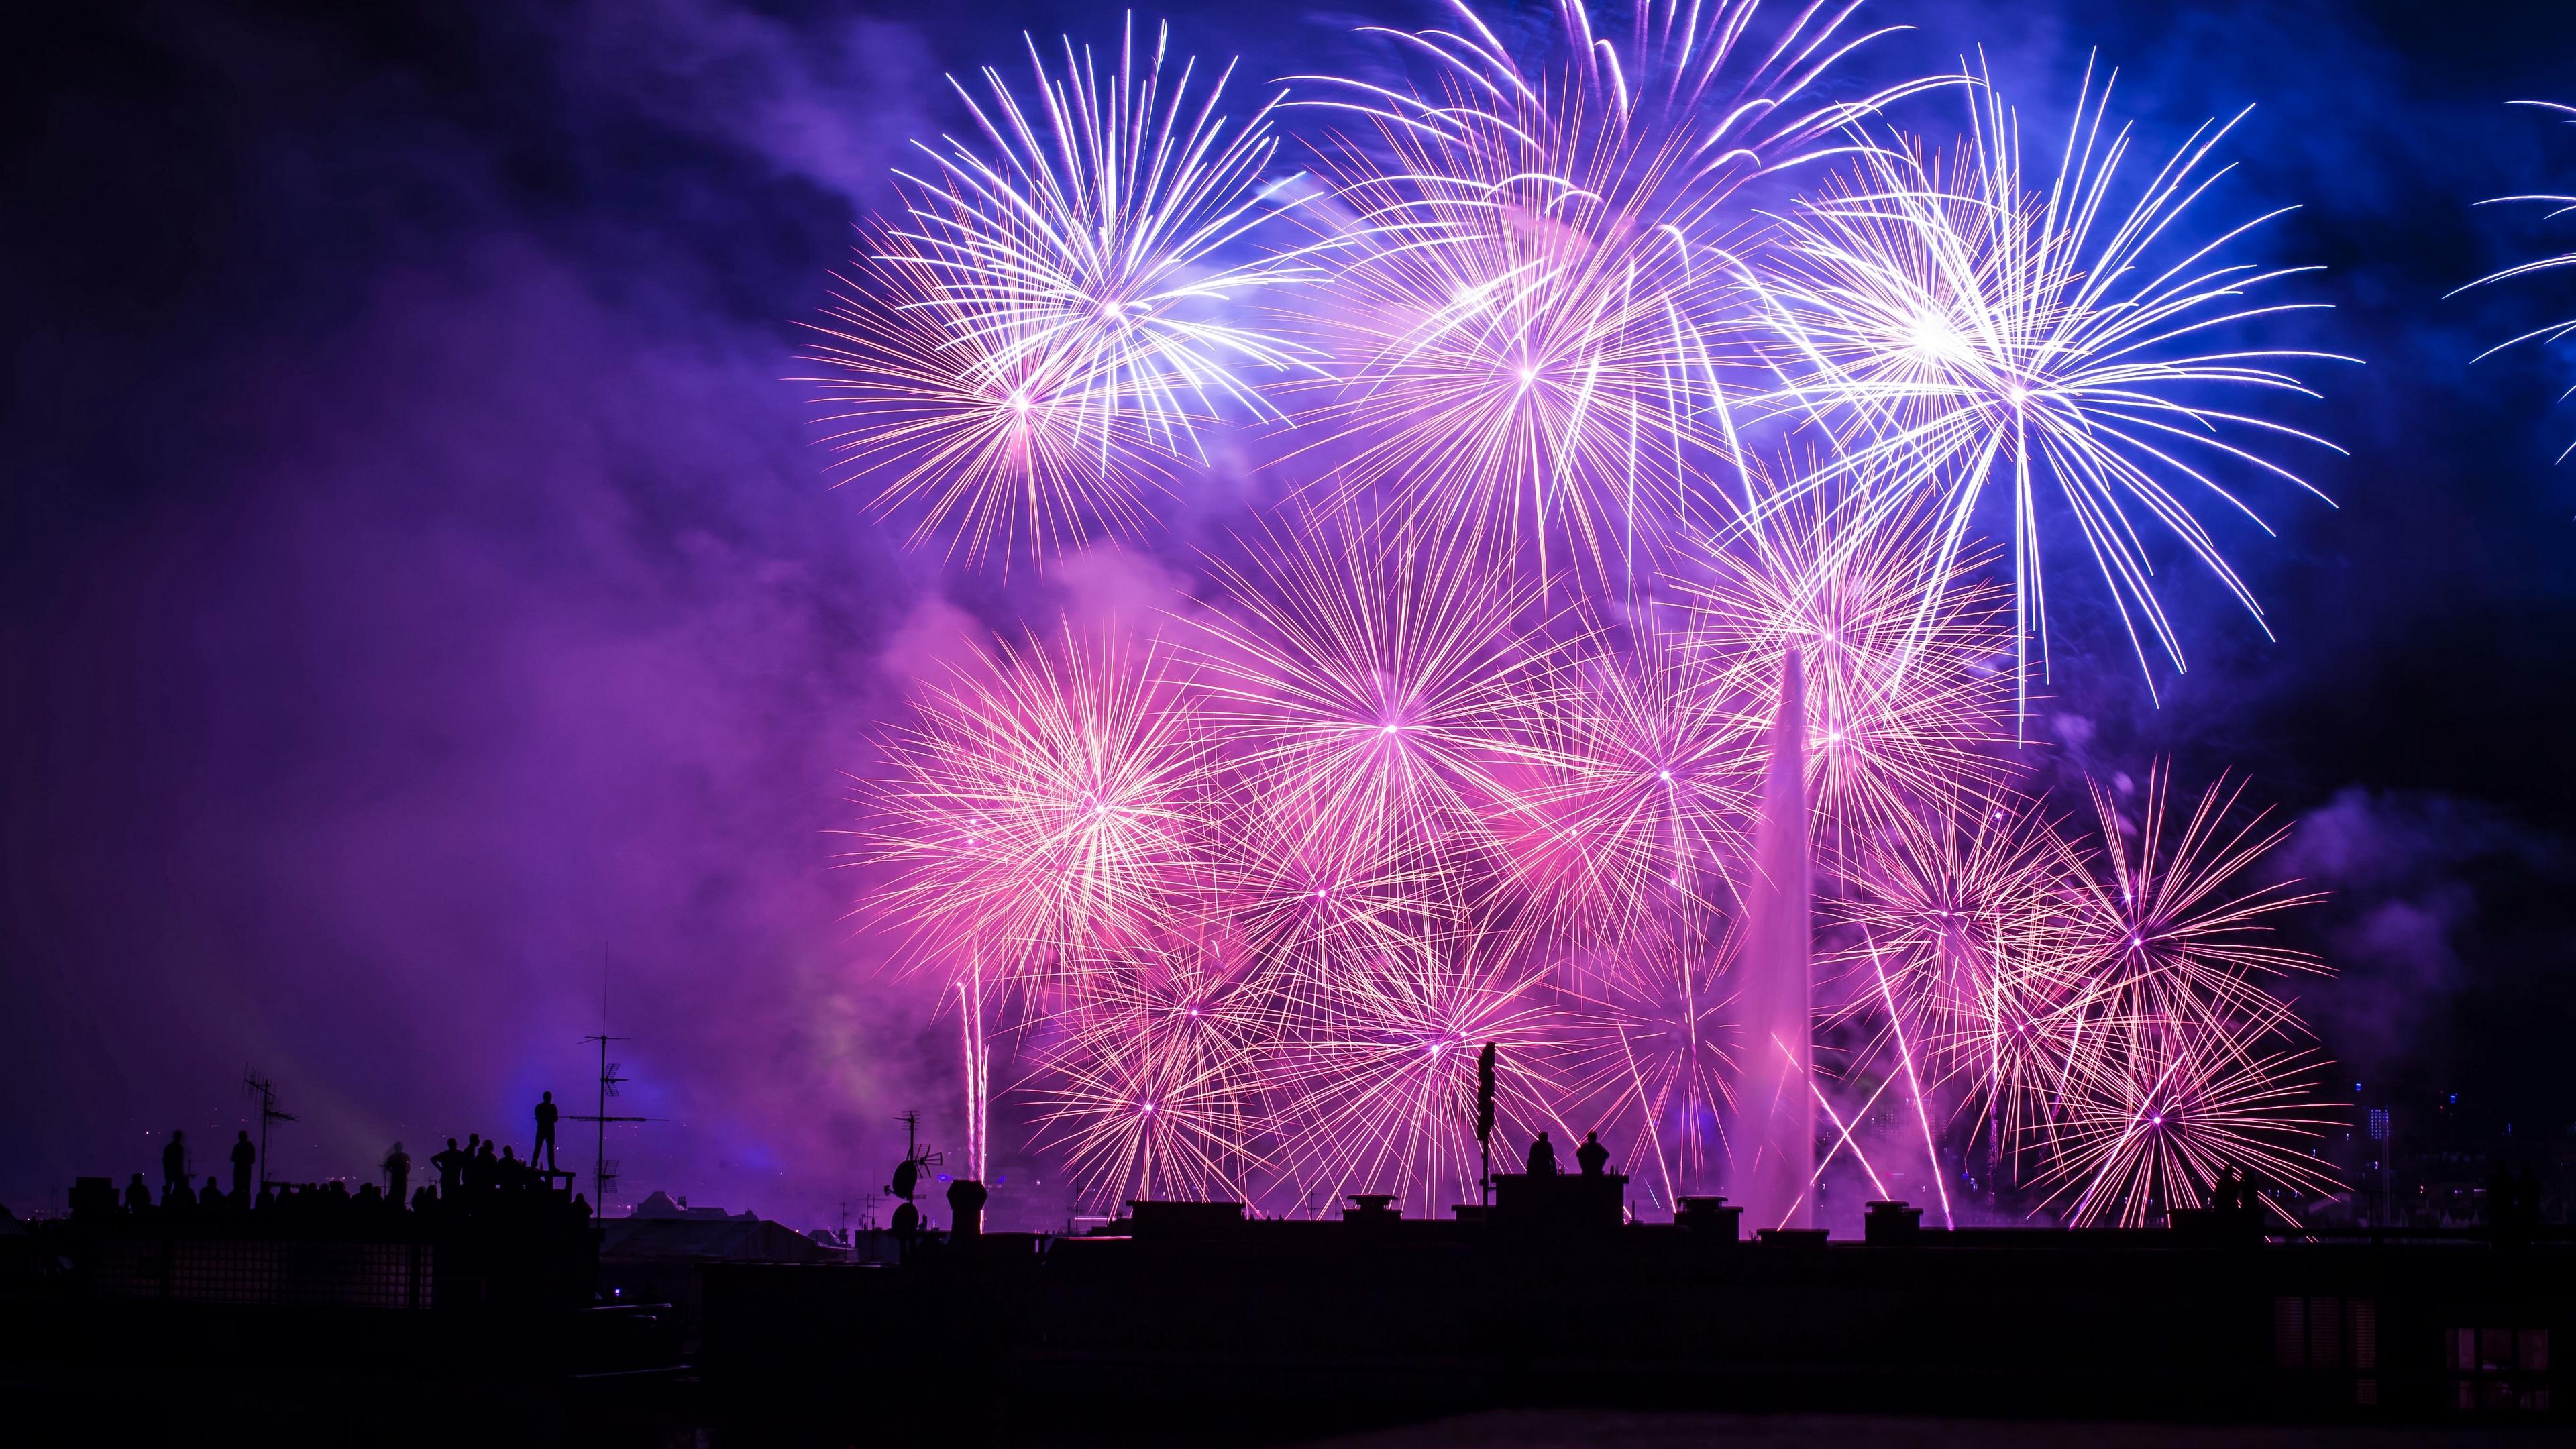 salute city holiday fireworks 4k 1538344787 - salute, city, holiday, fireworks 4k - salute, Holiday, City